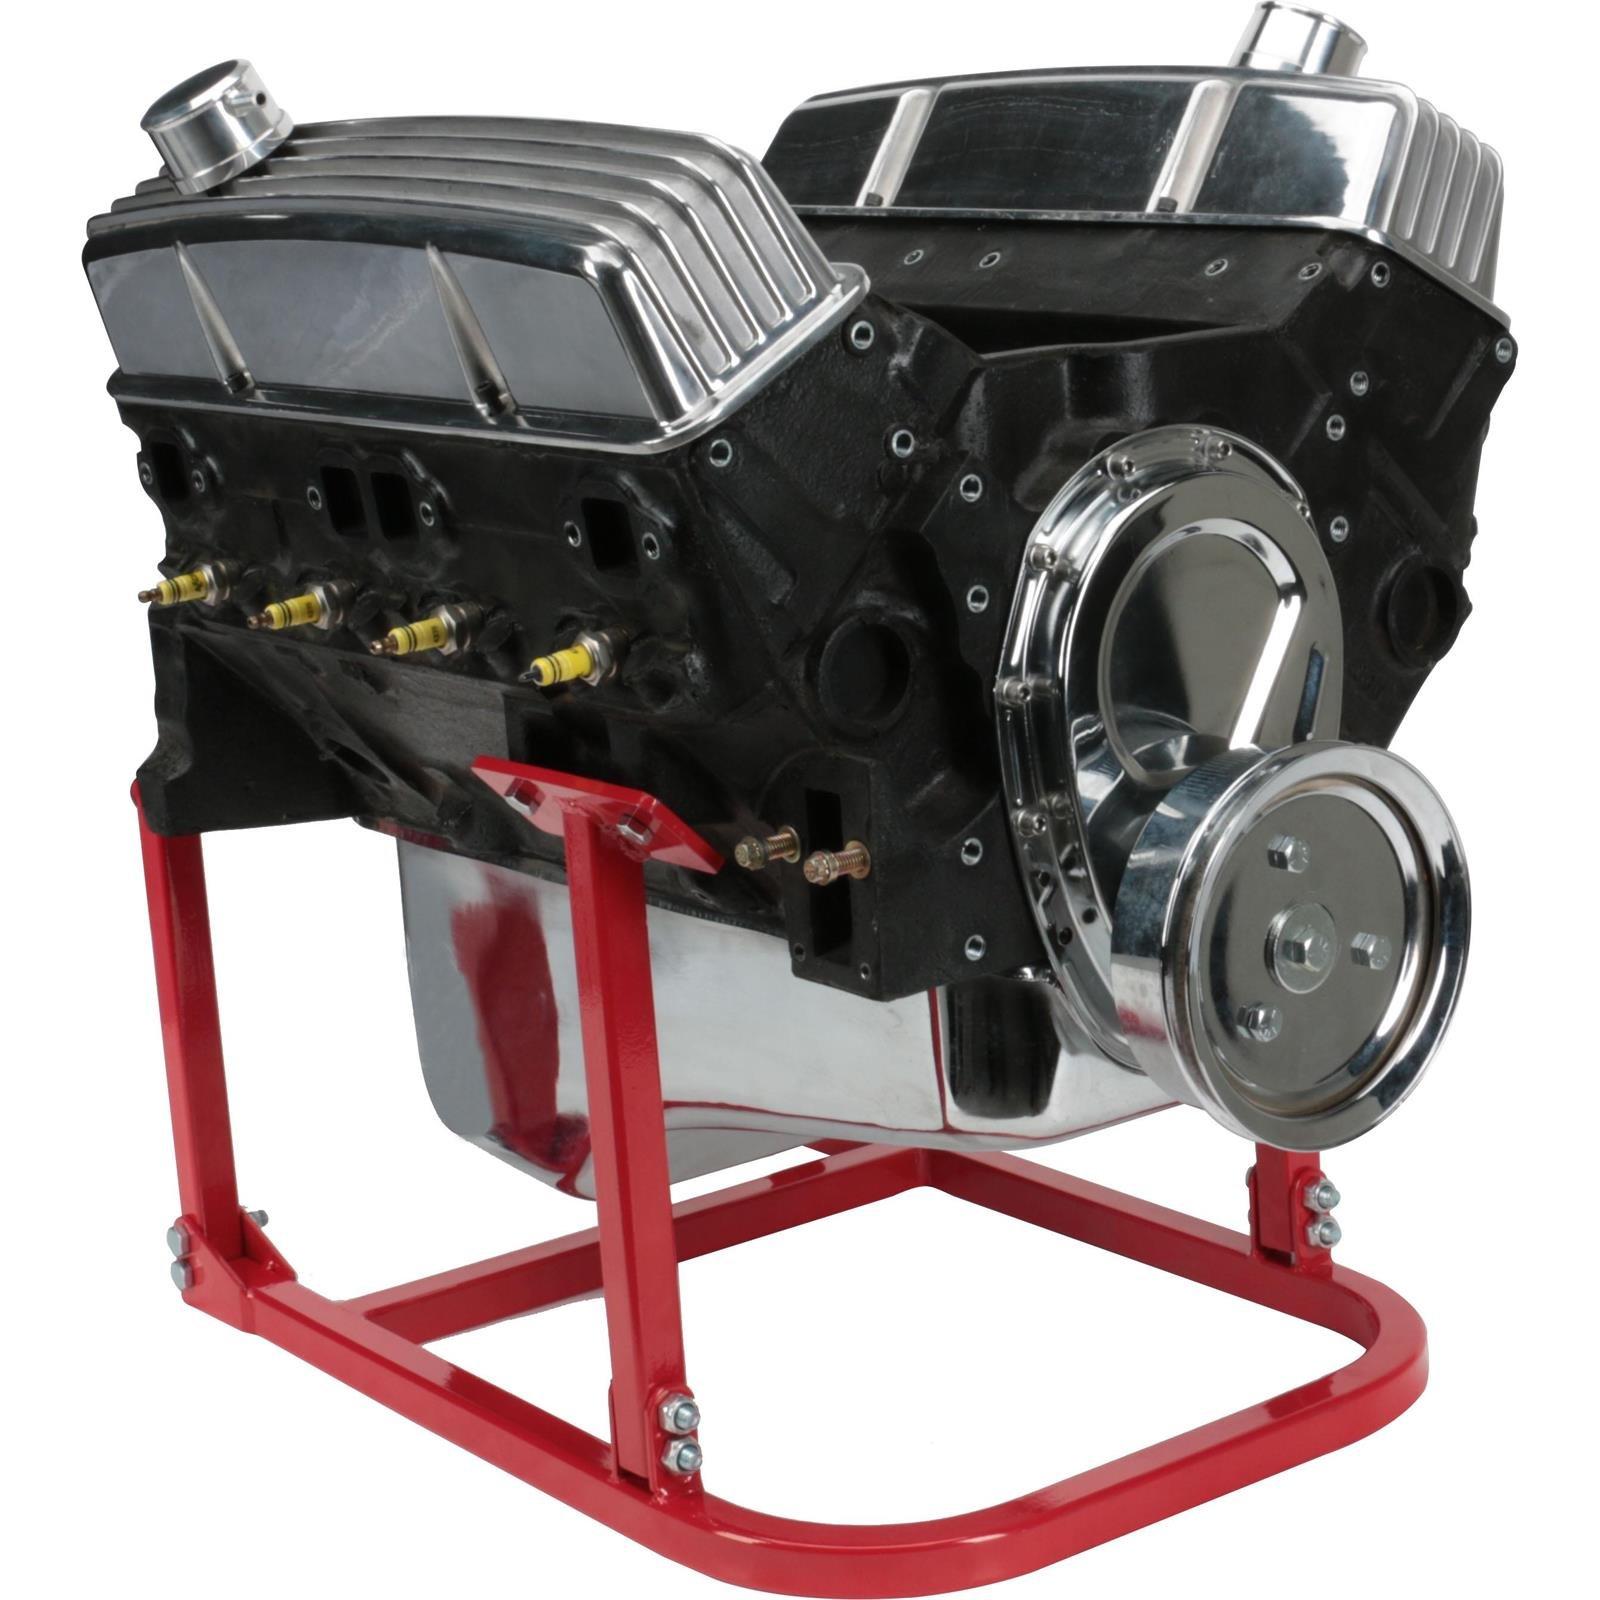 SBC Small Block Chevy Engine Storage Stand